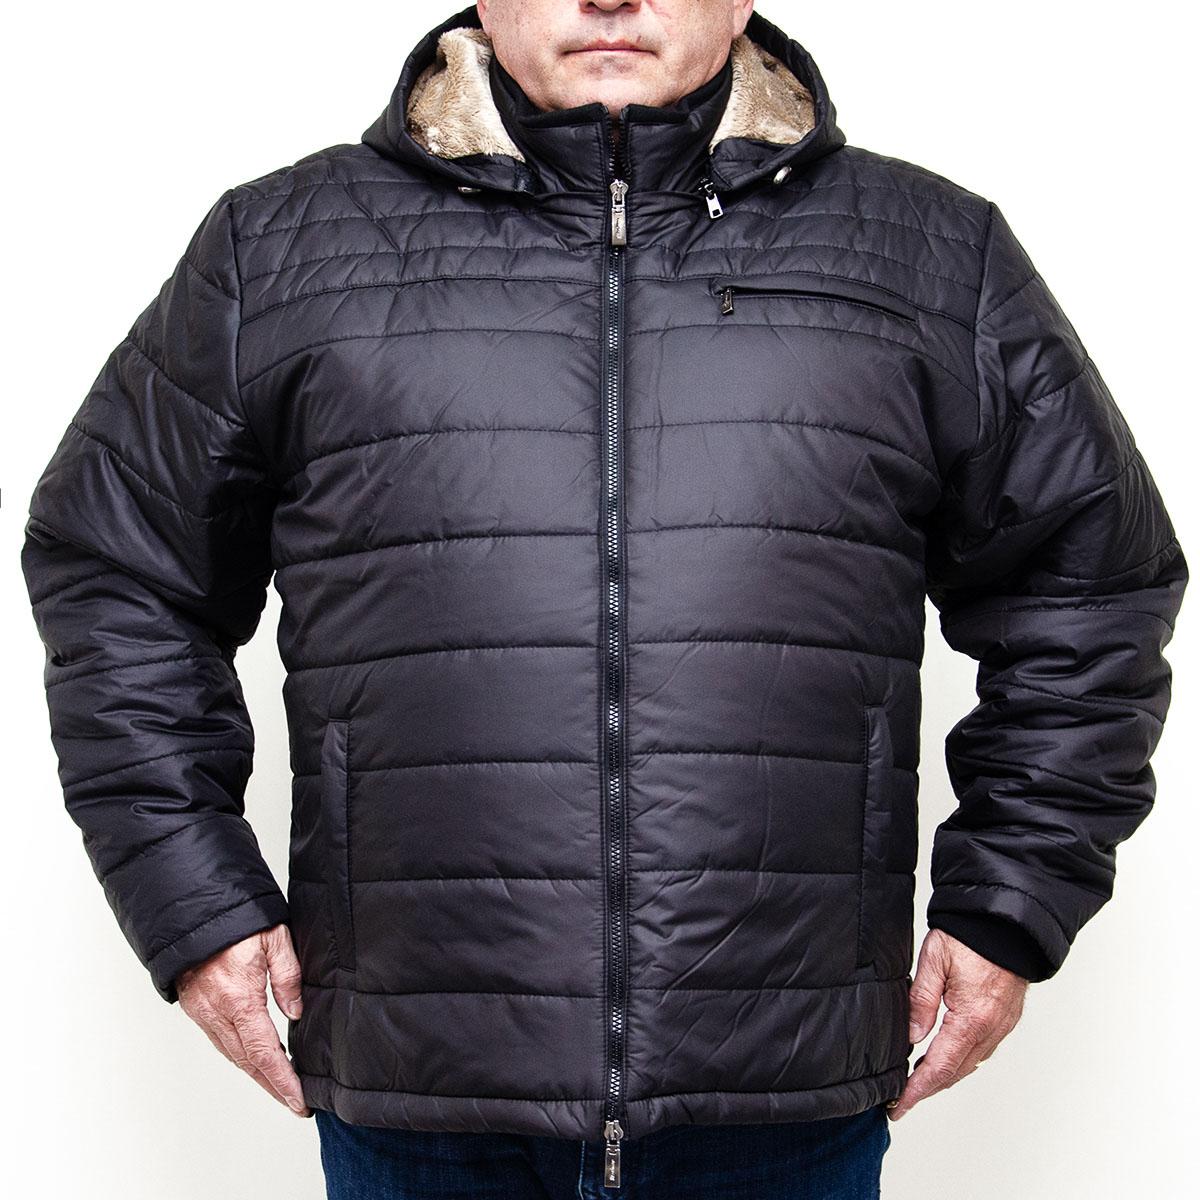 Geaca de iarna neagra cu gluga din fas, Marime 6XL - egato.ro